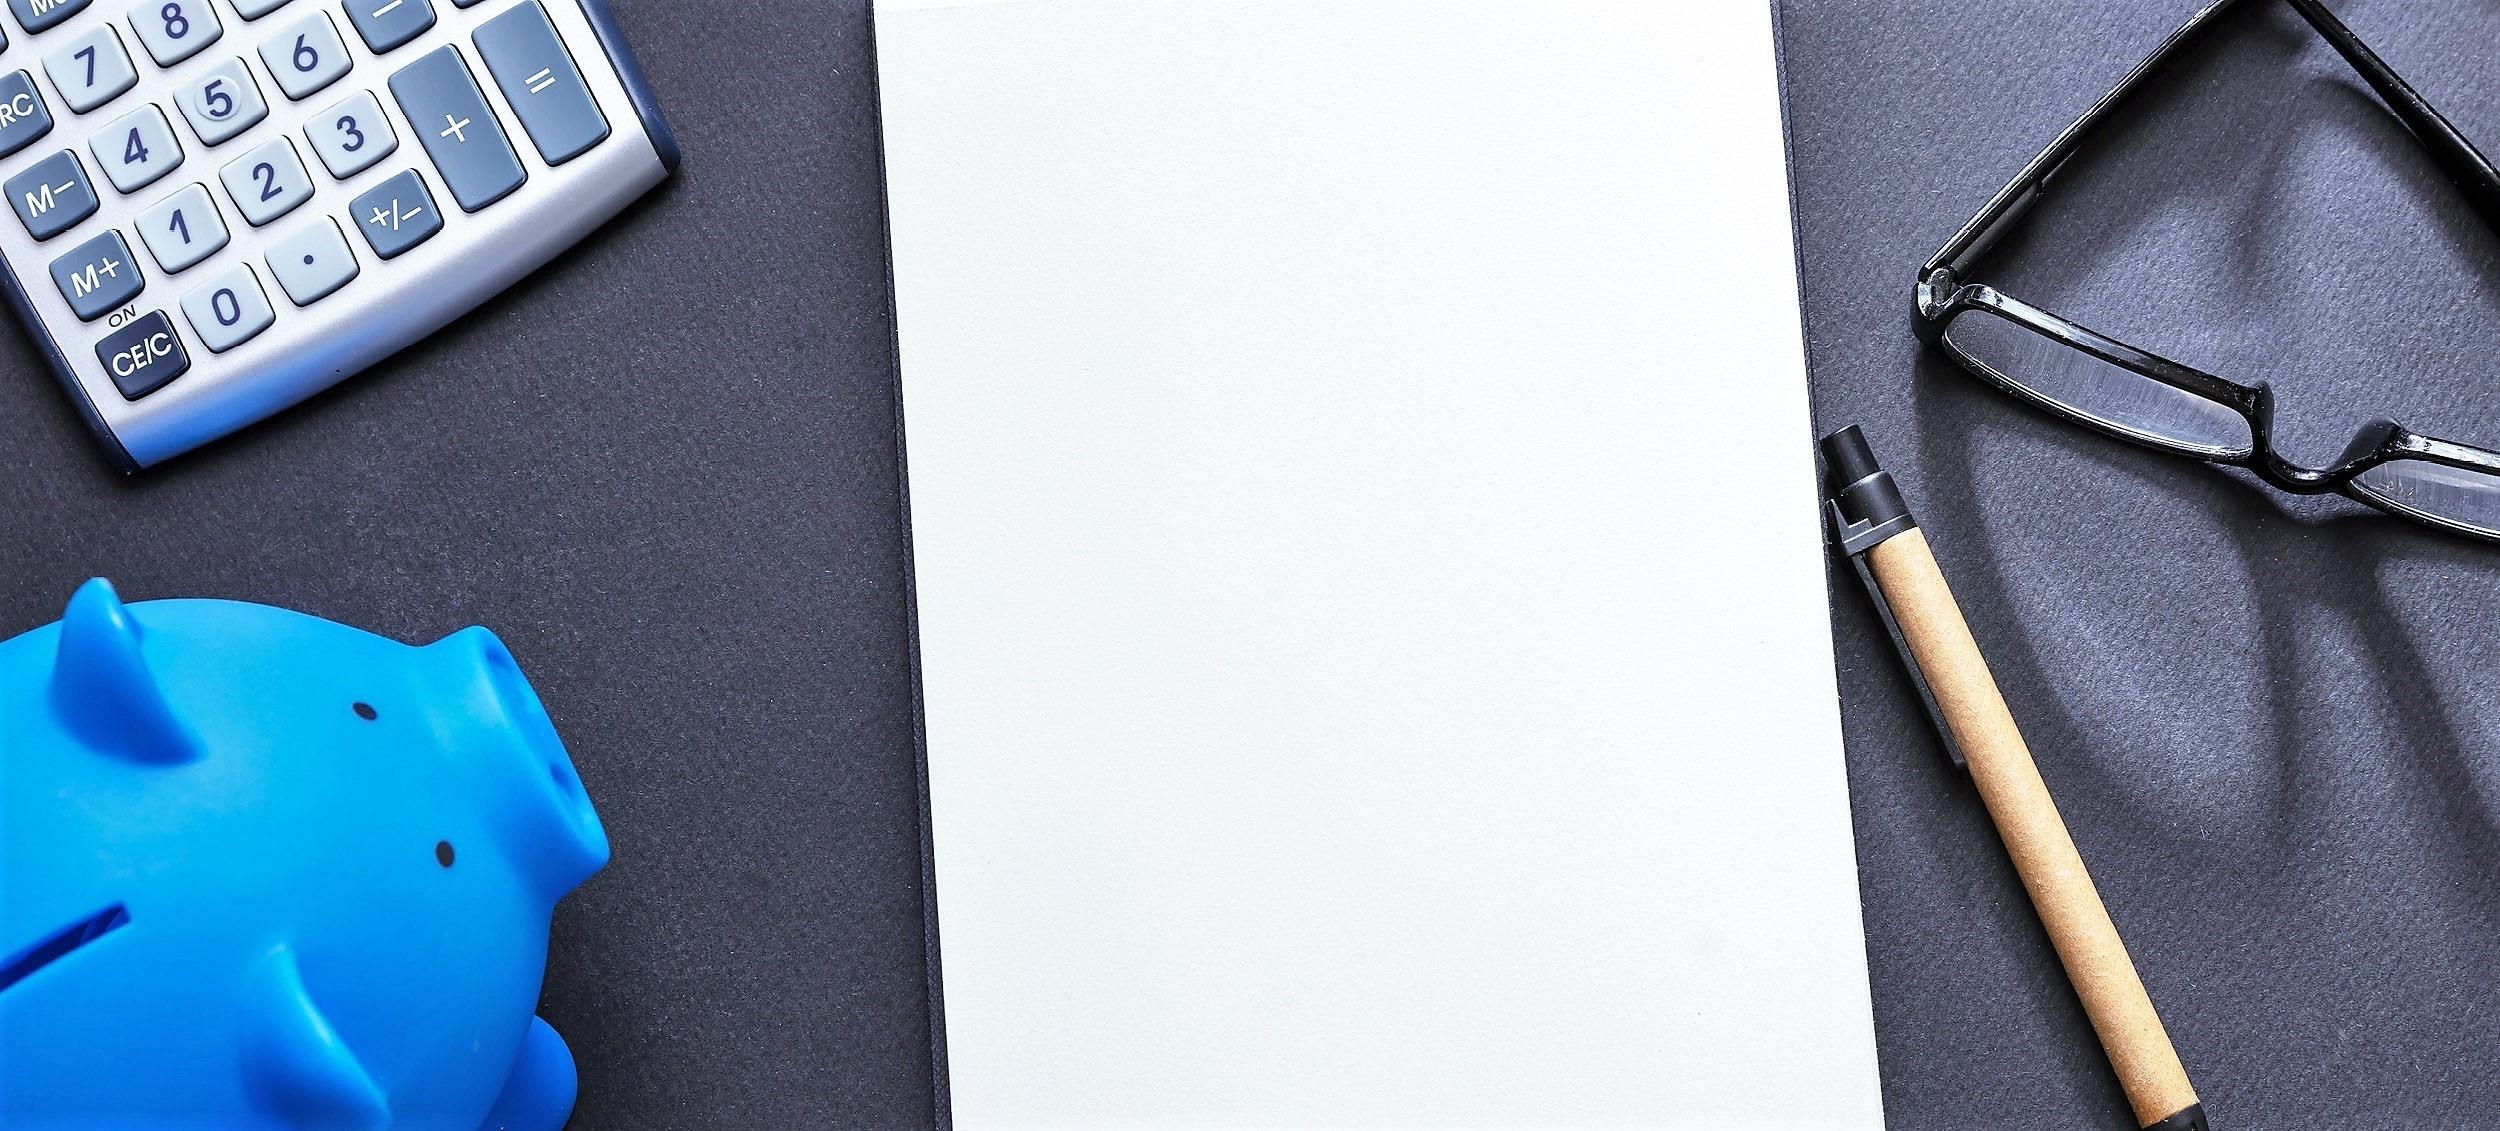 WEARMAX_Transparent_Kalkulation_Lino_PVC_Gummi